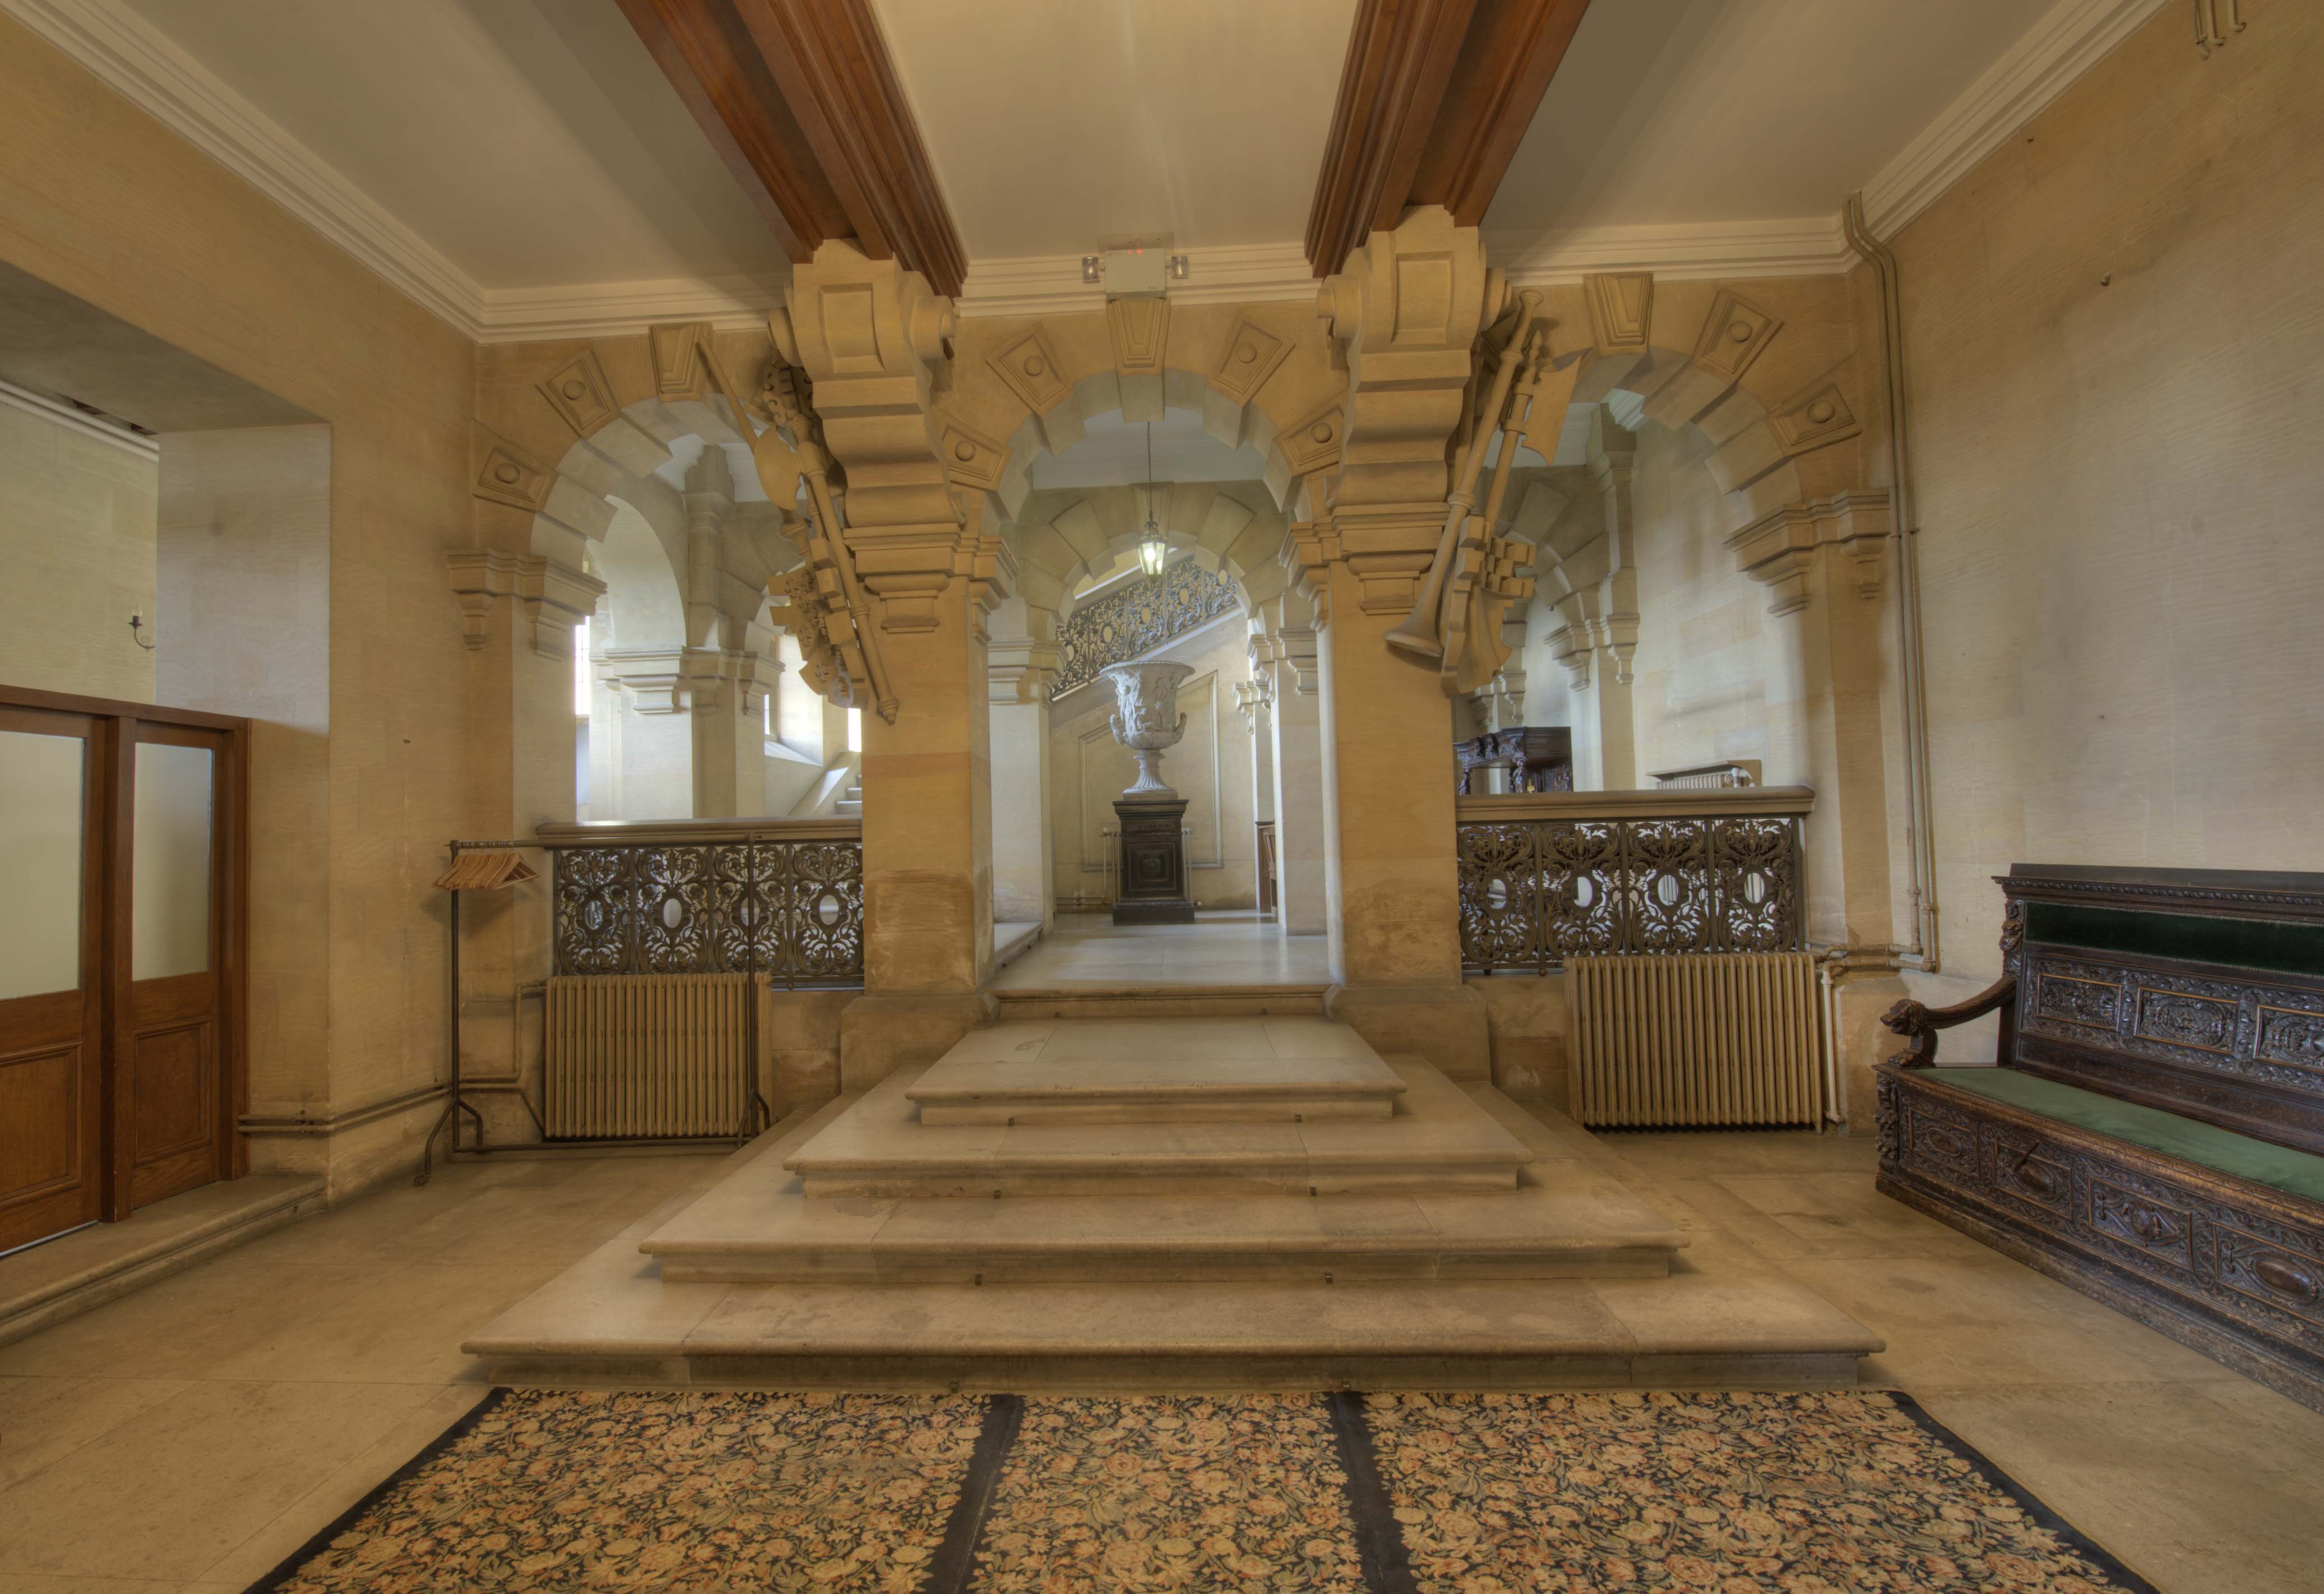 Entrance Hall | Harlaxton Manor Archives